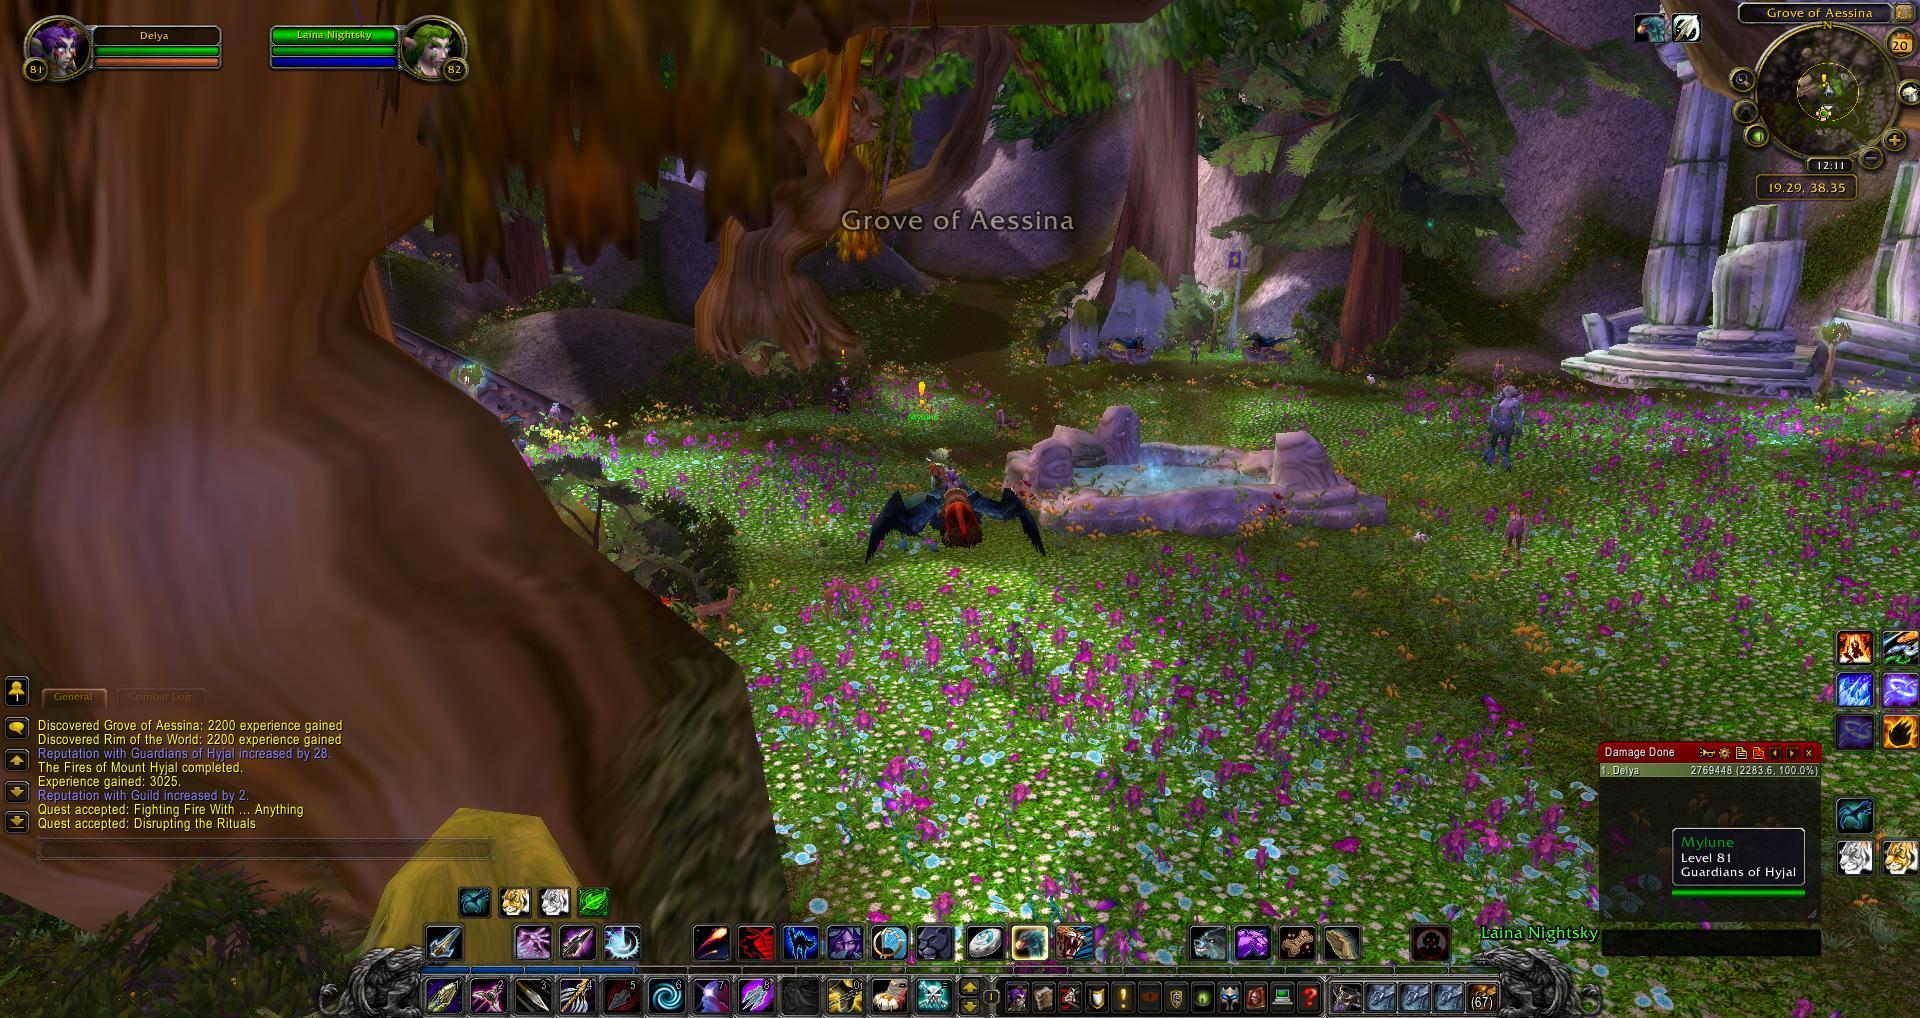 Mount Hyjal Grove Of Aessina Wow Screenshot Gamingcfgcom